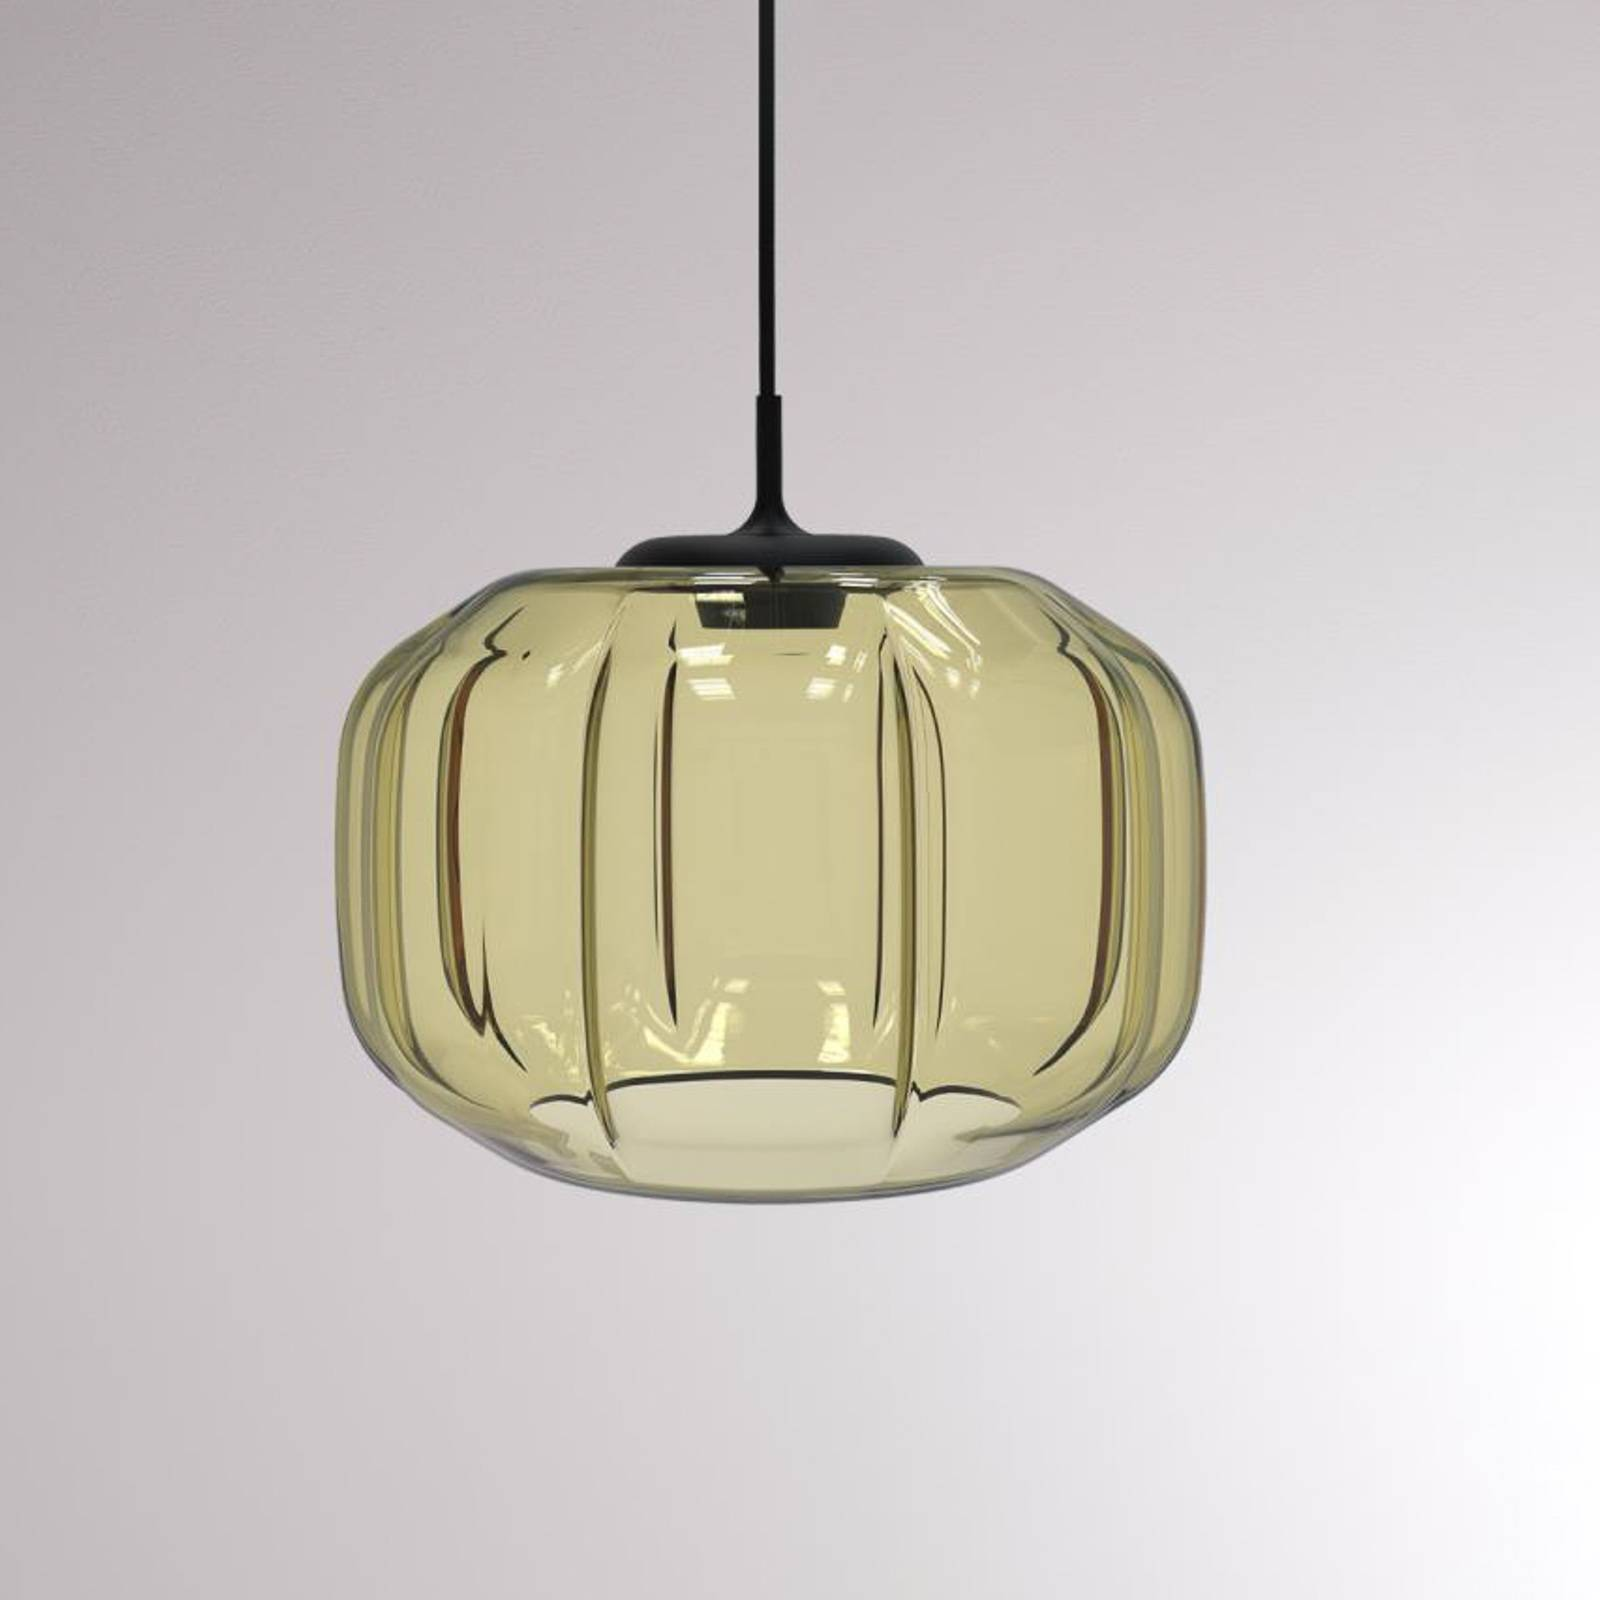 LOUM Fiori -LED-riippuvalaisin, samppanja